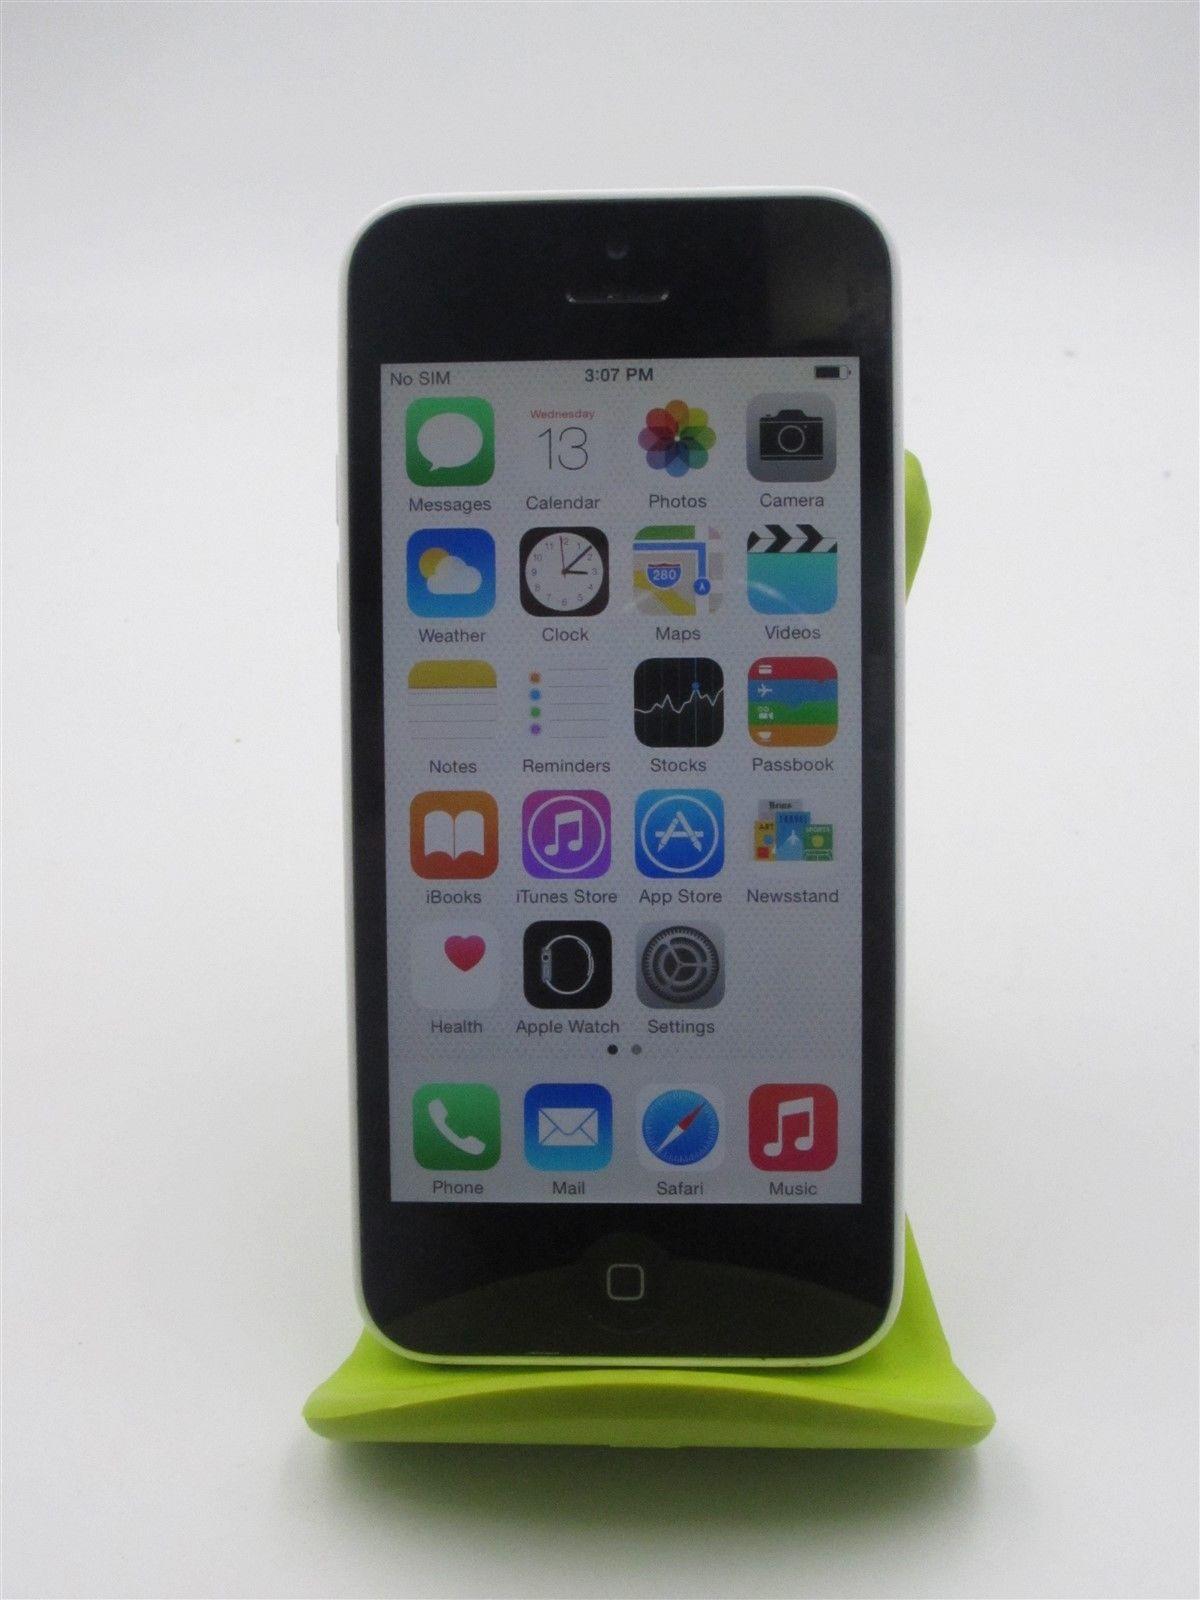 Apple Iphone 5c A1532 Fido White 8gb Poor Conditionpr4552 Refurbishedphones